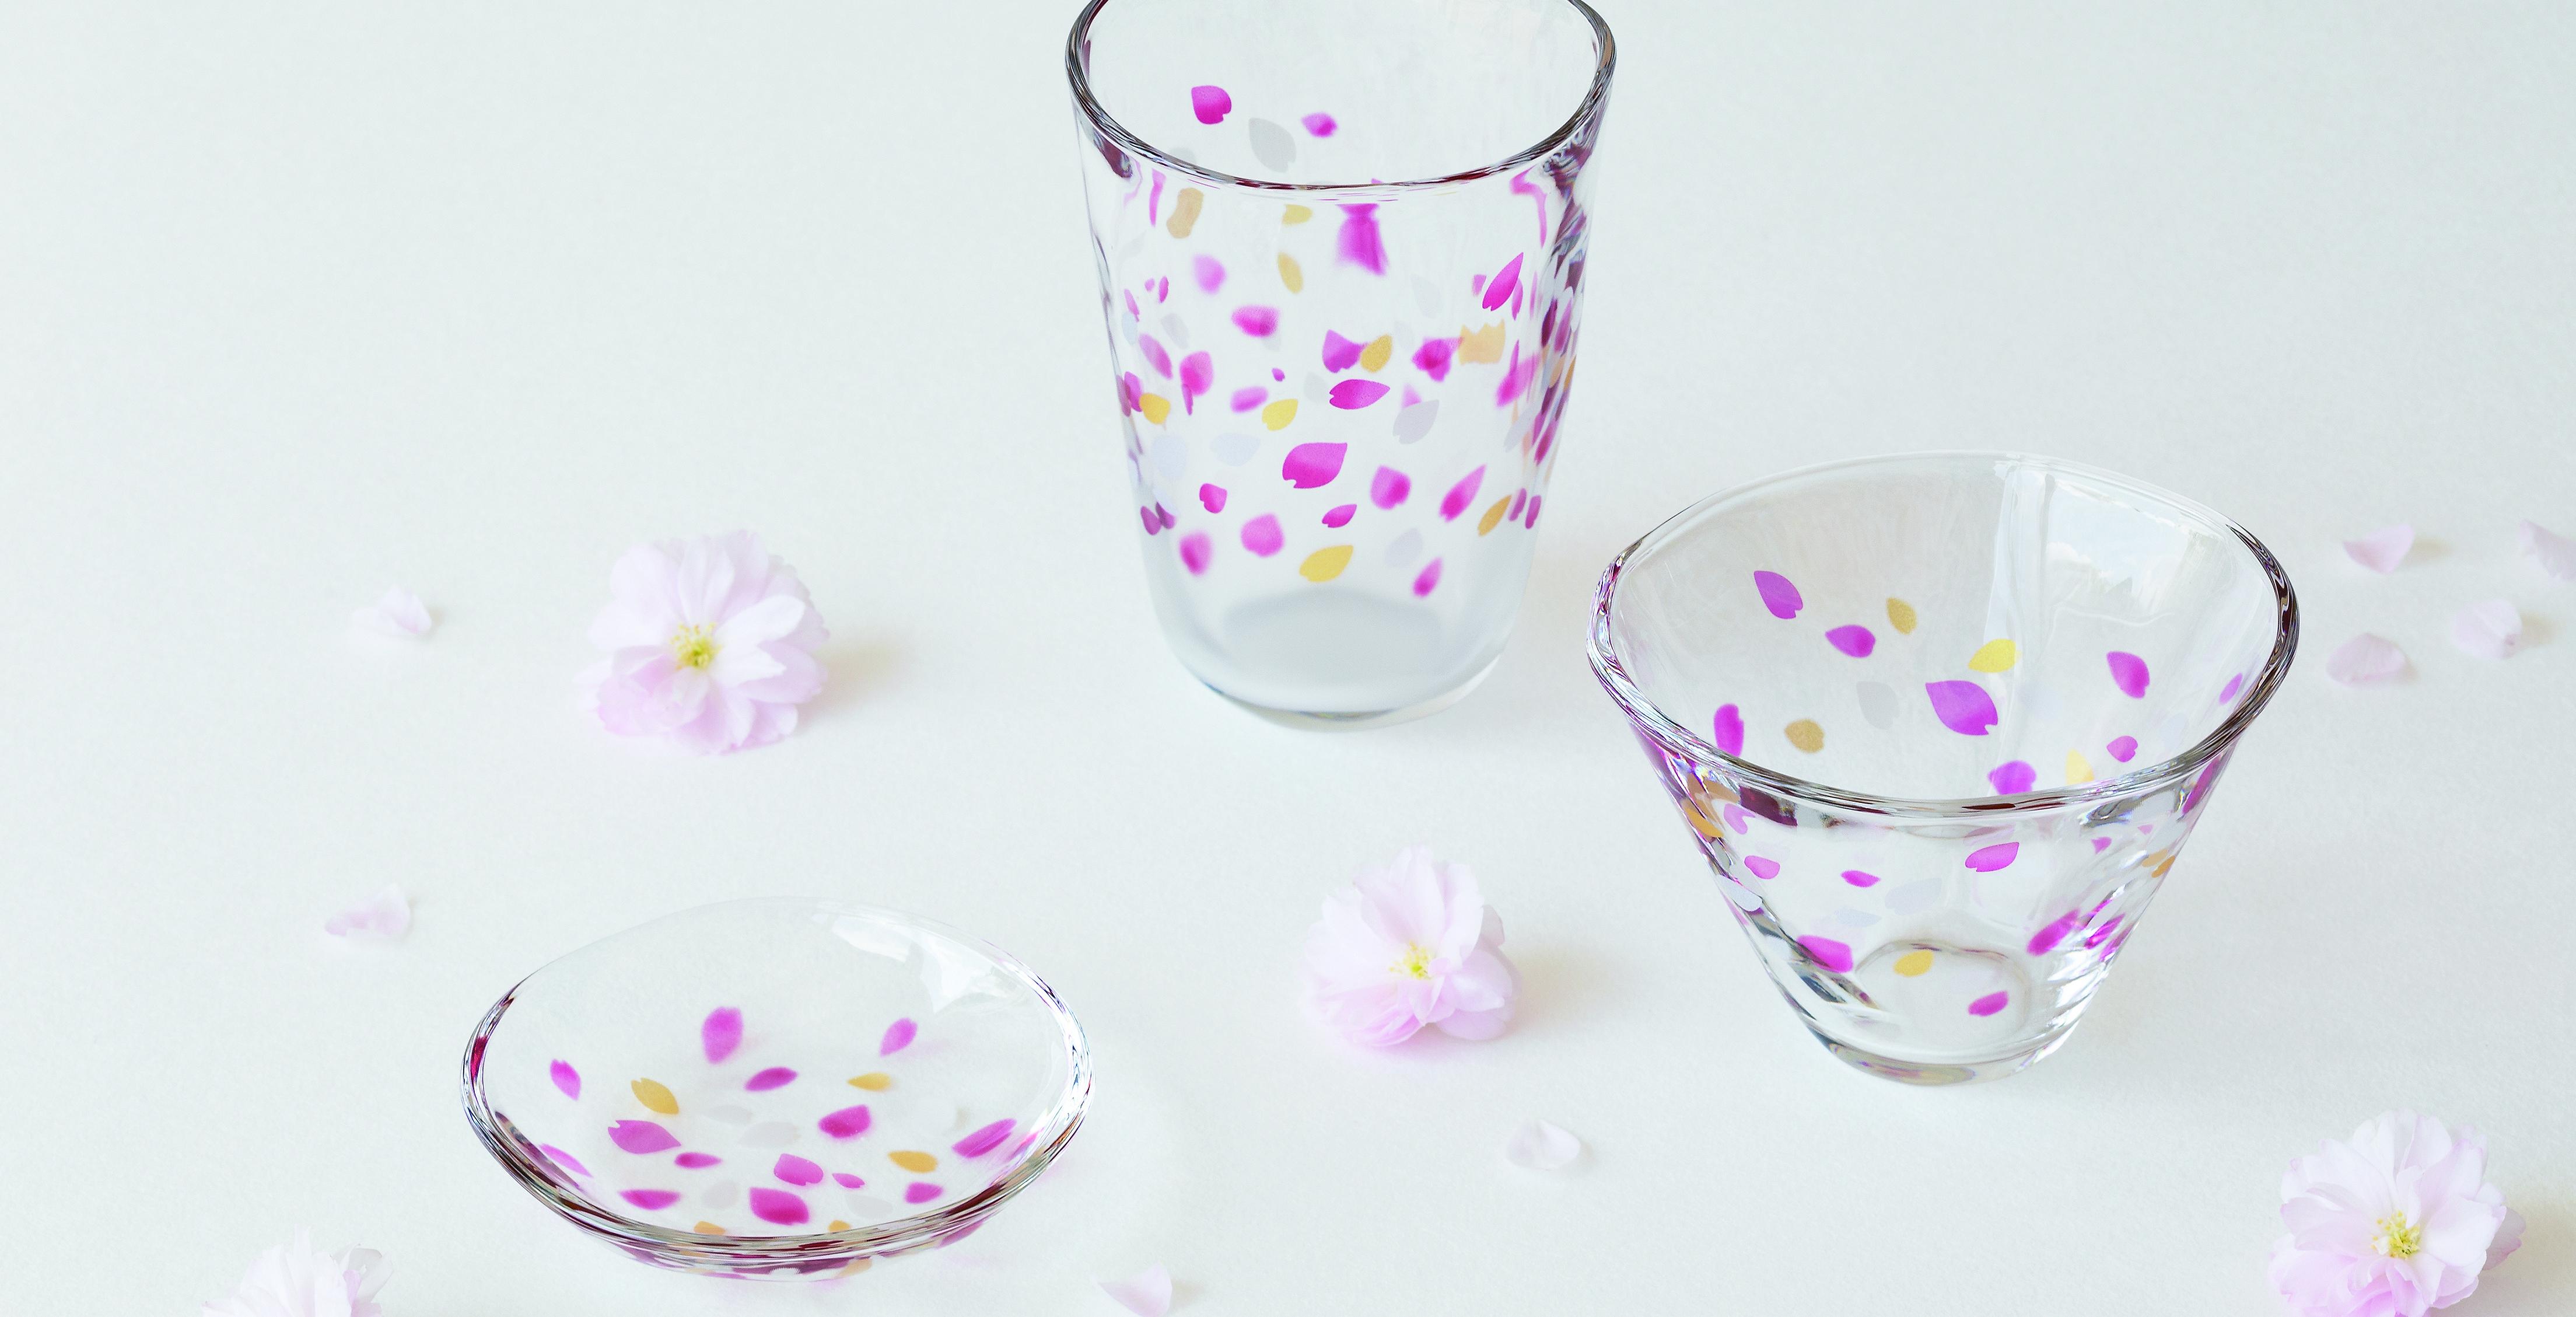 TEBINERI HARUIRO|日本製|ガラス食器ブランド ADERIA|アデリア